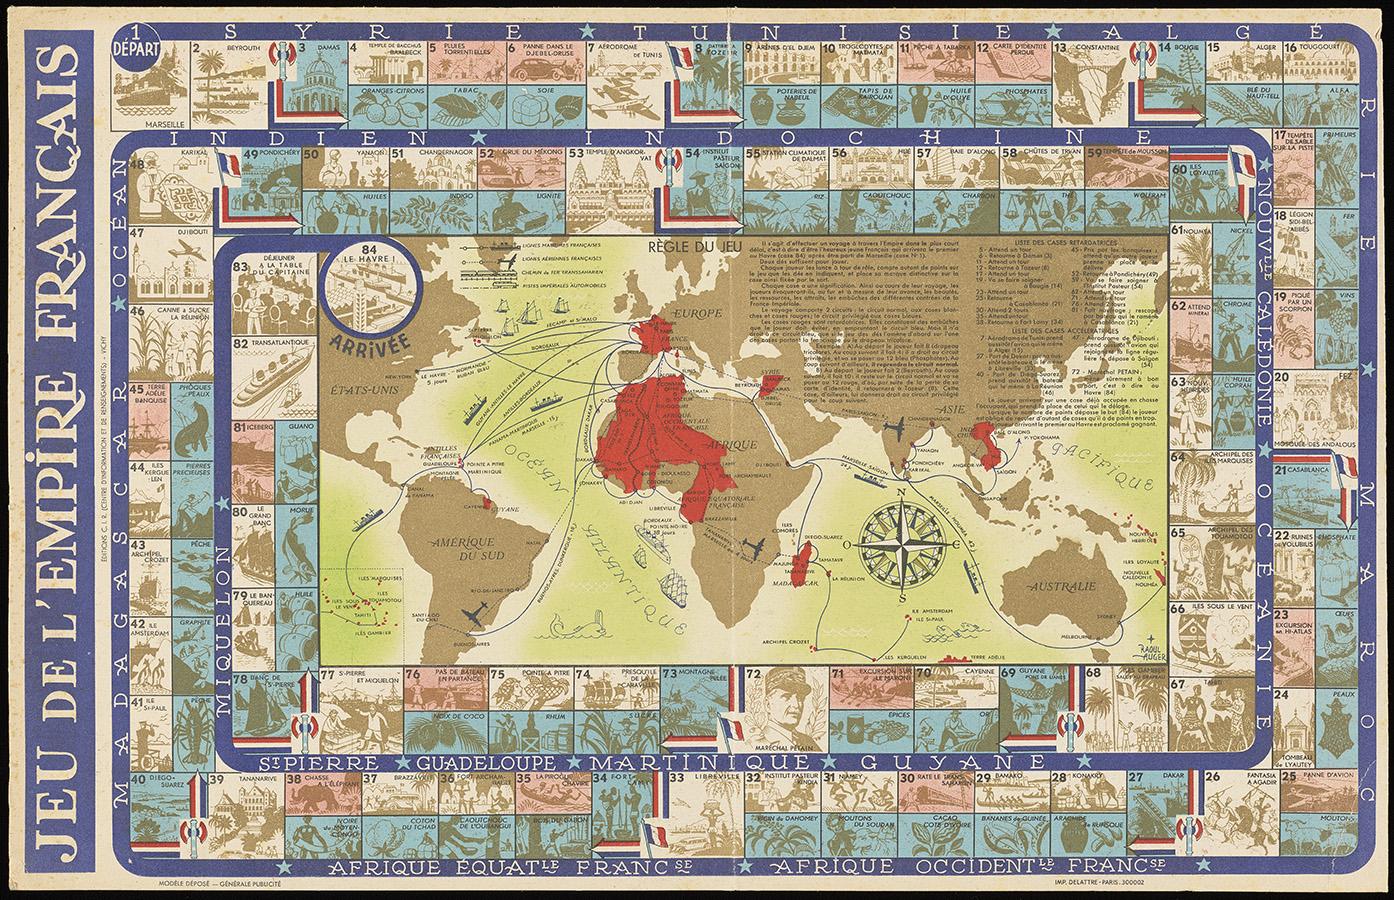 Raoul Auger (1904–1991), Jeu de l'Empire Français (The French Empire Game), two-sided game board, 1941. Imprimerie Delattre.Image courtesy